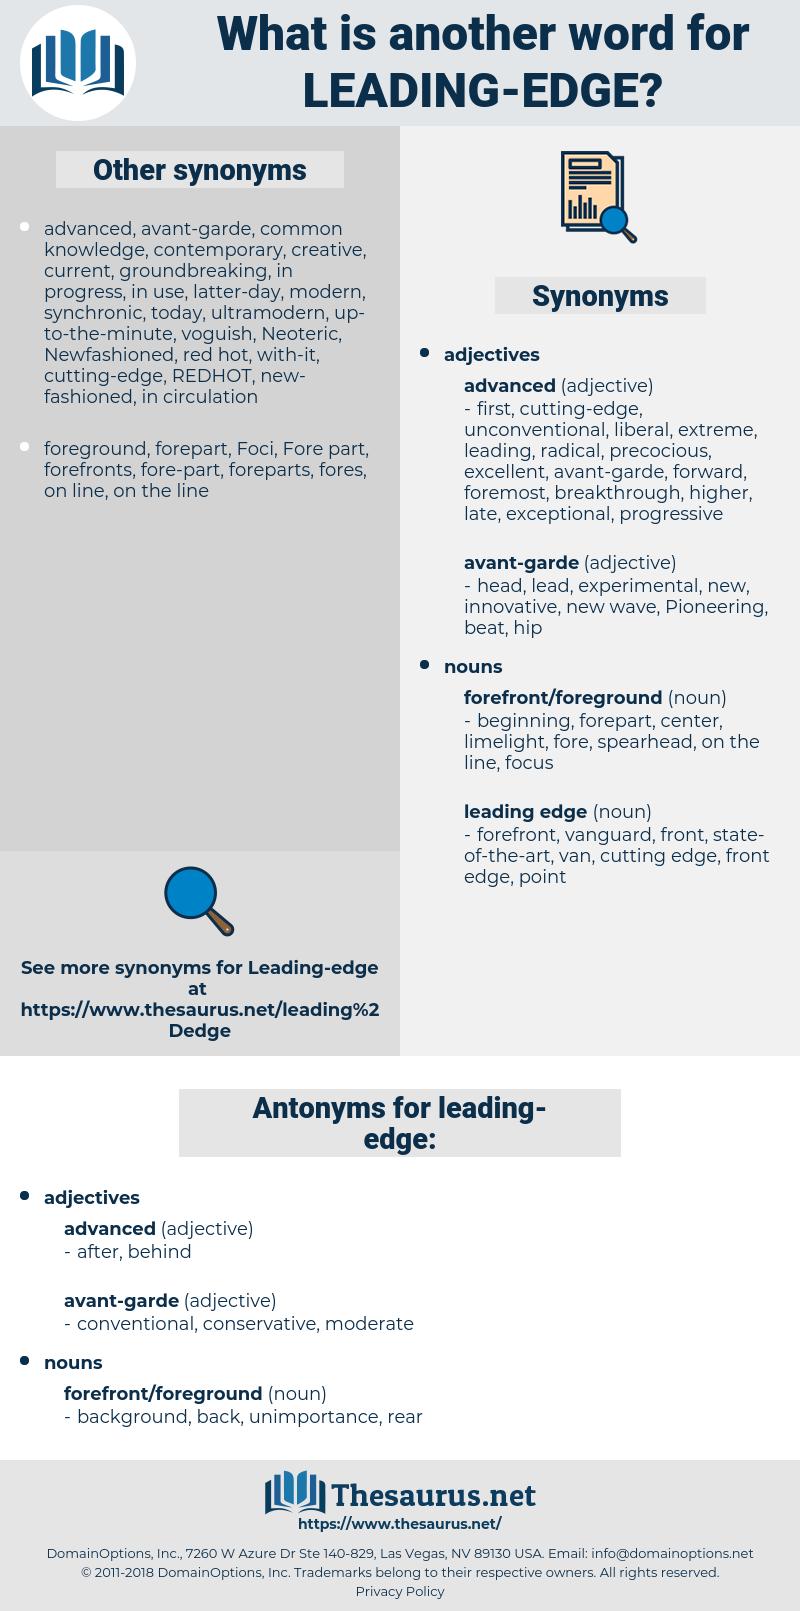 leading-edge, synonym leading-edge, another word for leading-edge, words like leading-edge, thesaurus leading-edge